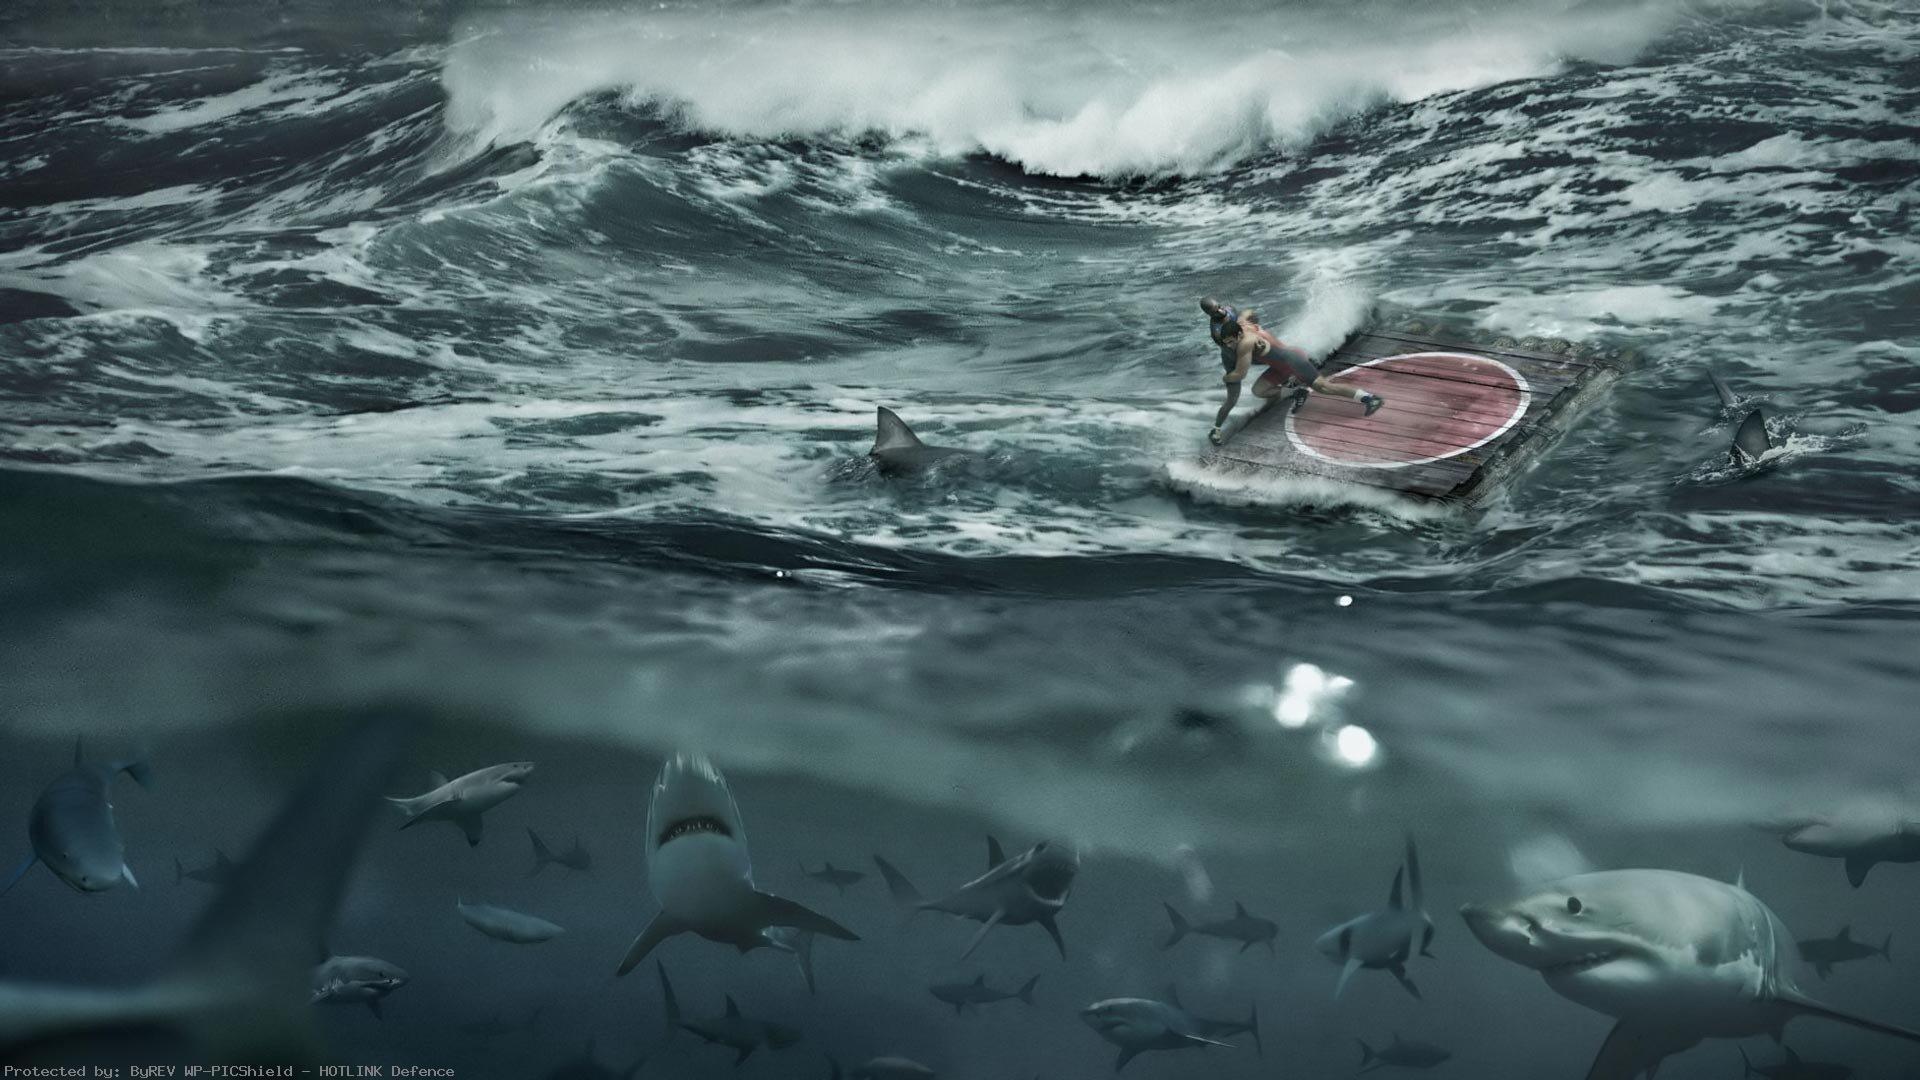 Wrestling-ring-water-ocean-shark1920x1080-via-Classy-Bro-